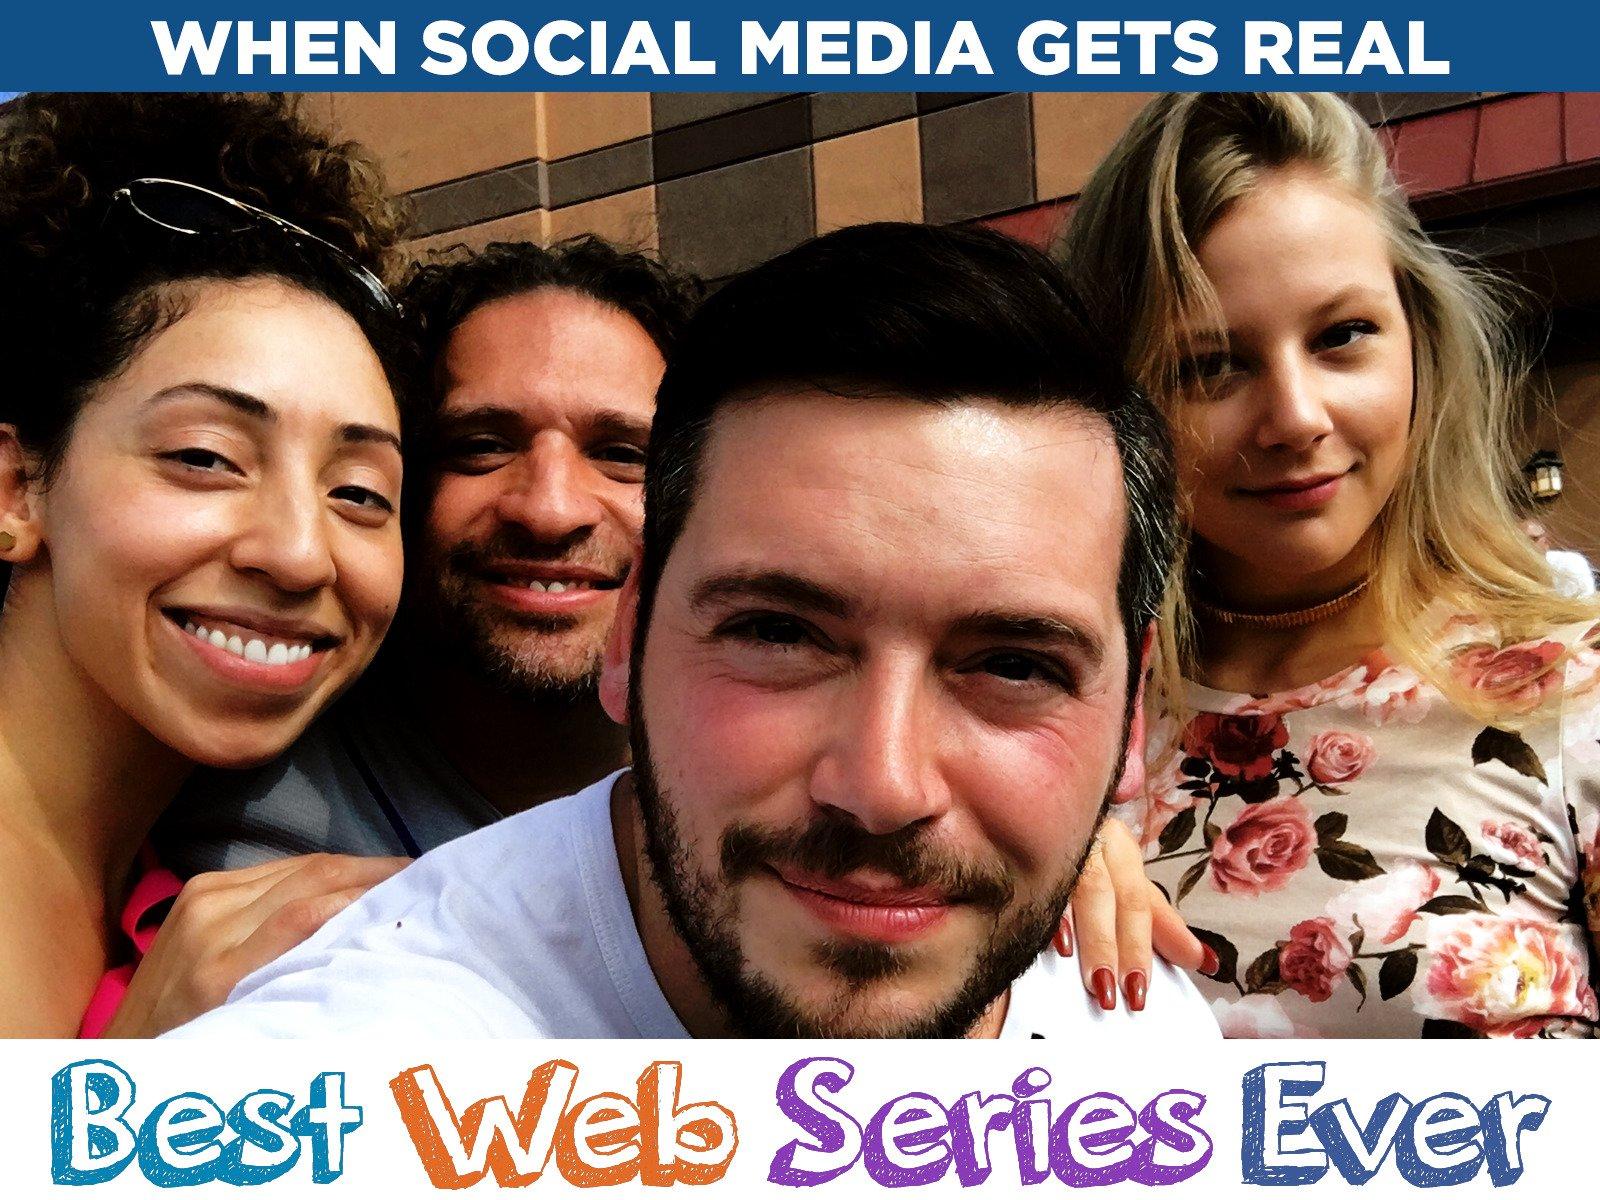 Clip: Best Web Series Ever - Season 1